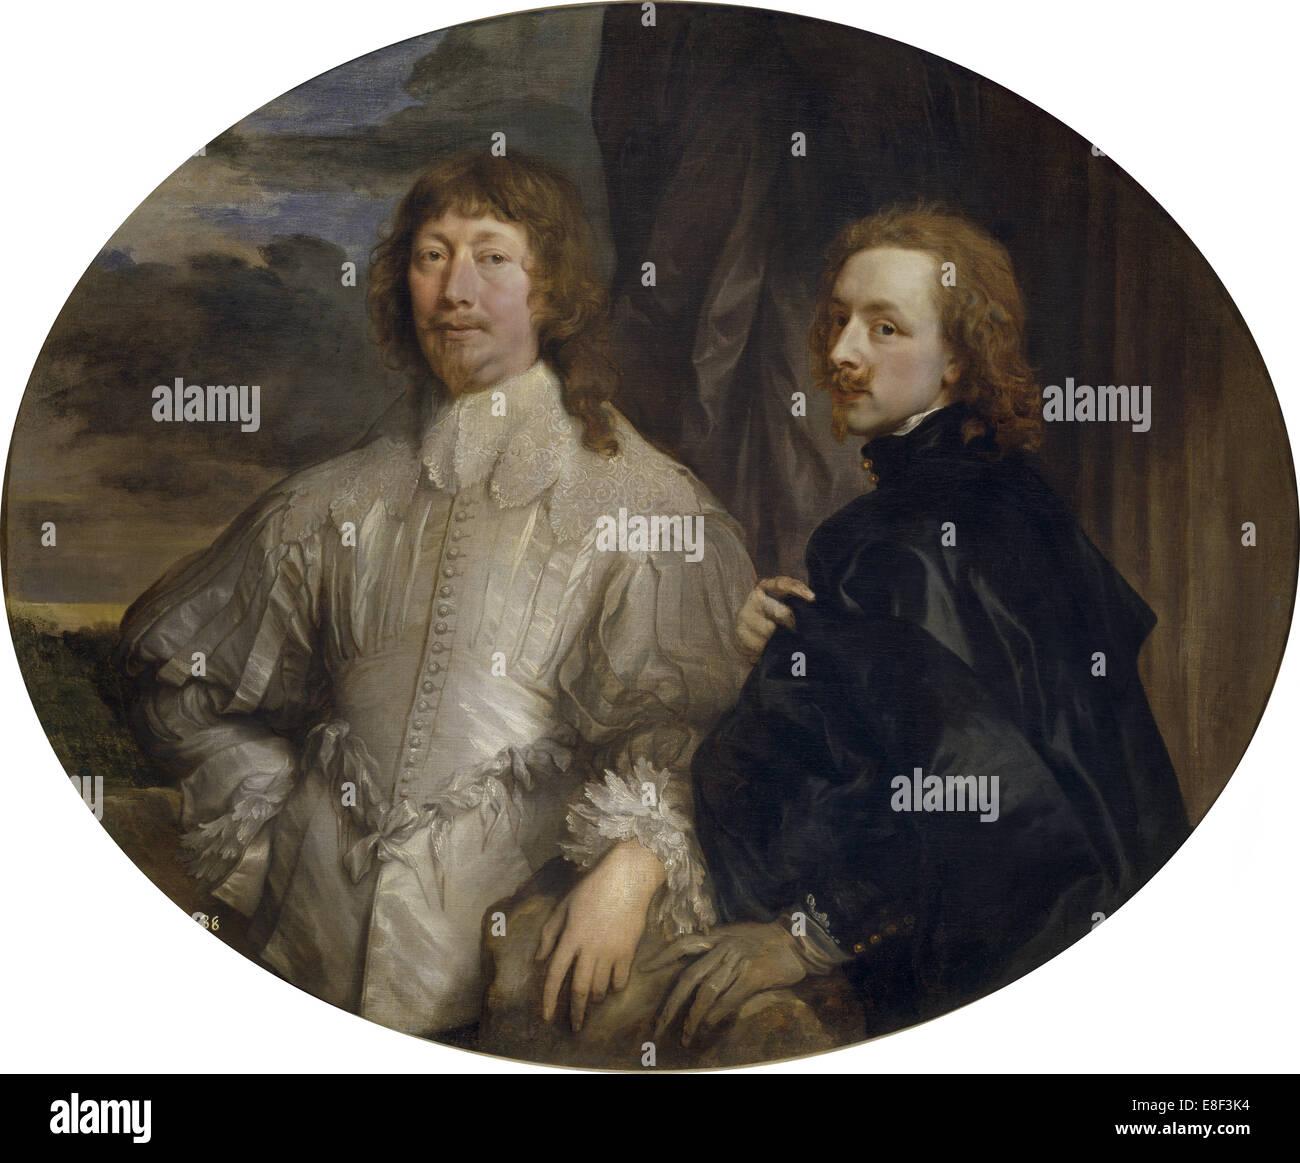 Sir Endymion Porter and Sir Anthony van Dyck. Artist: Dyck, Sir Anthony van (1599-1641) - Stock Image